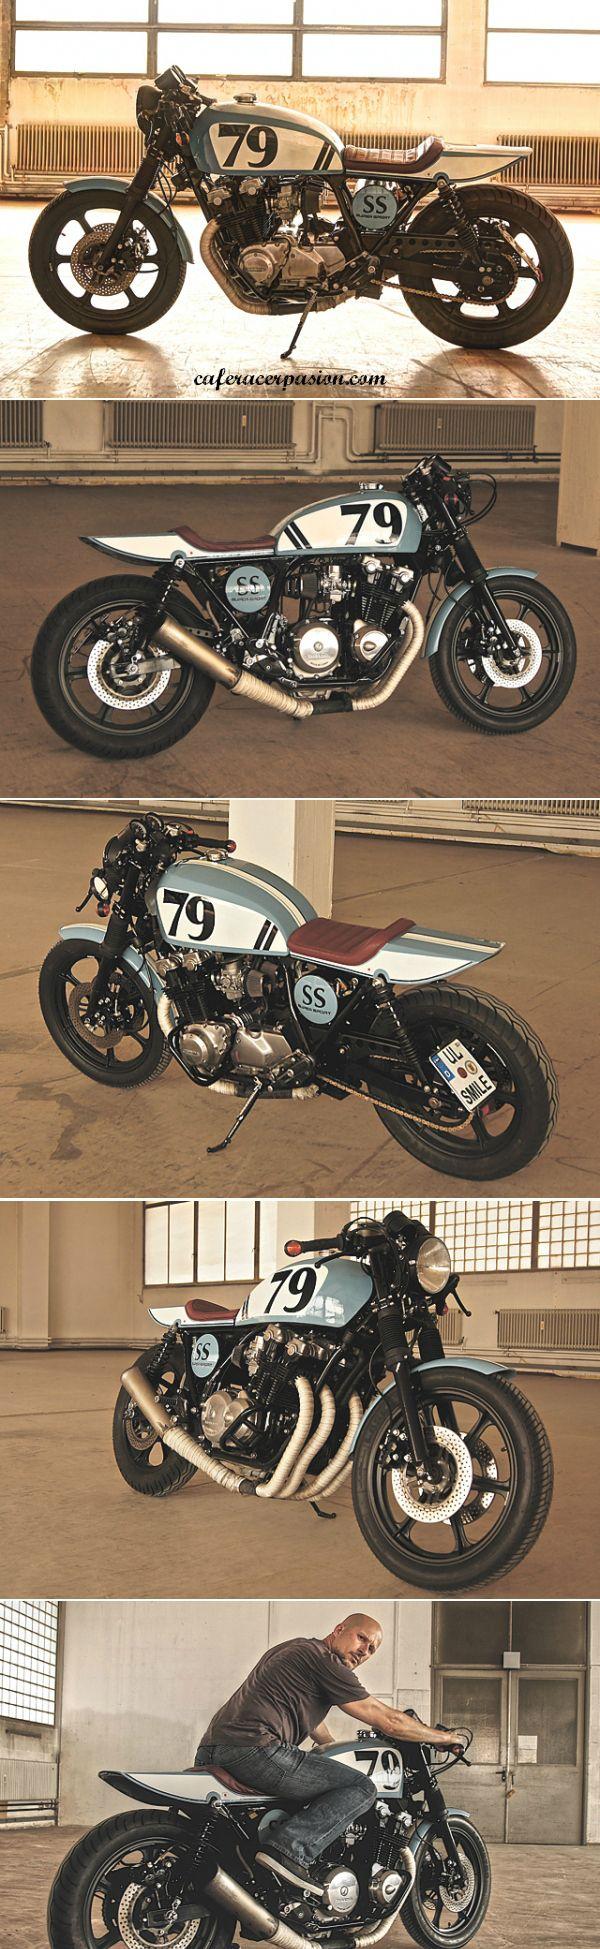 Honda cb900f bol dor cafe racer by Andrea Goldemann #motorcycles #caferacer #motos | caferacerpasion.com